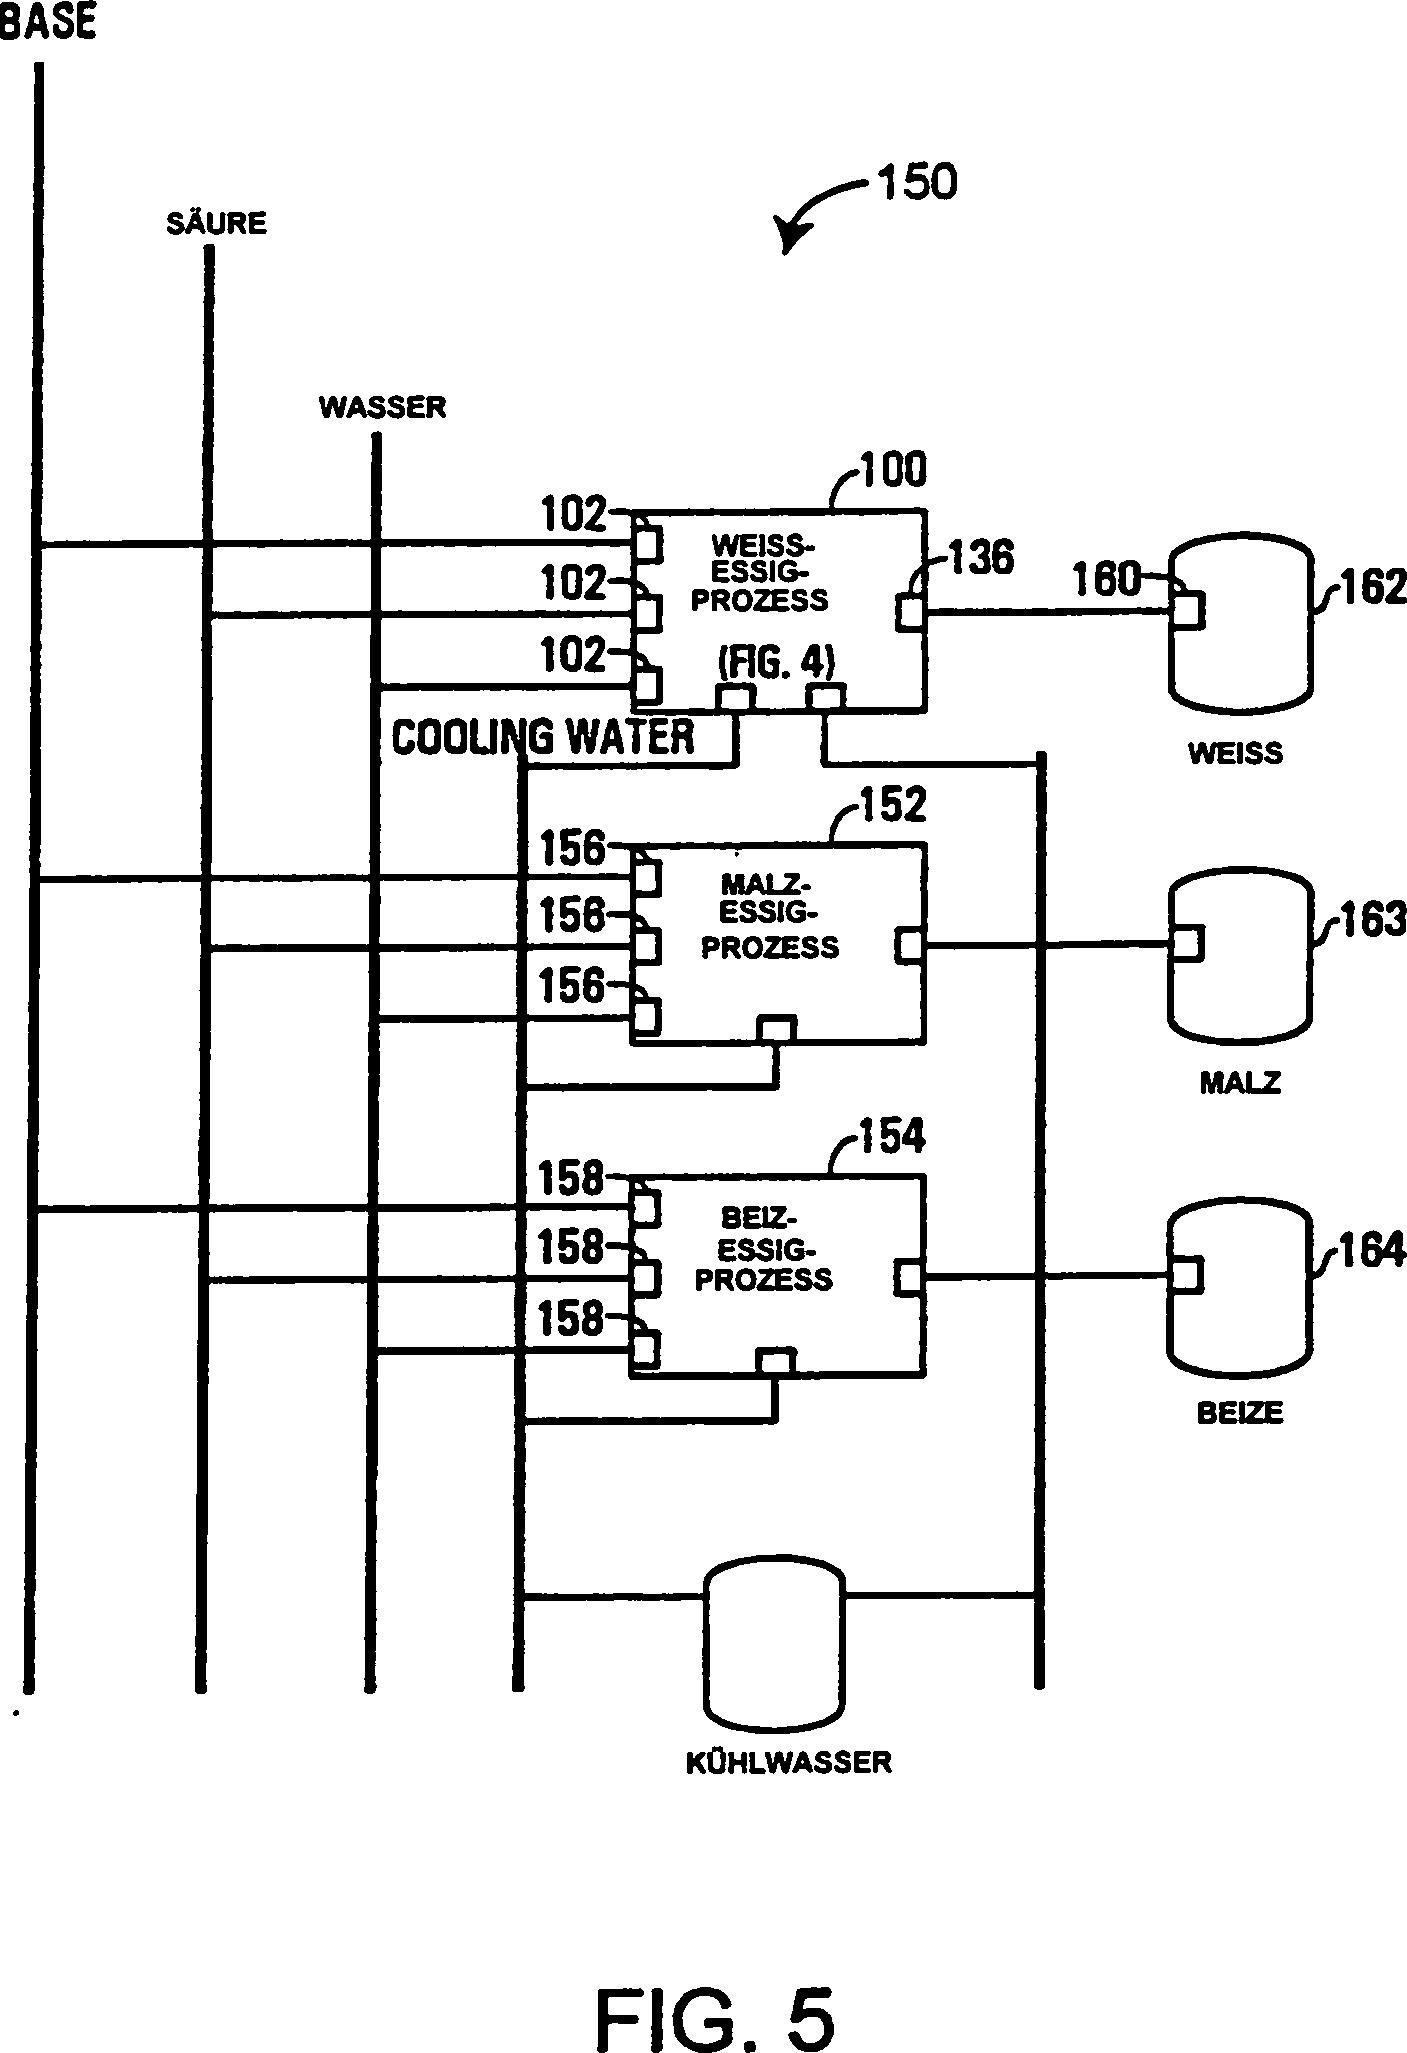 Tolle Blockdiagrammschaltung Fotos - Schaltplan Serie Circuit ...